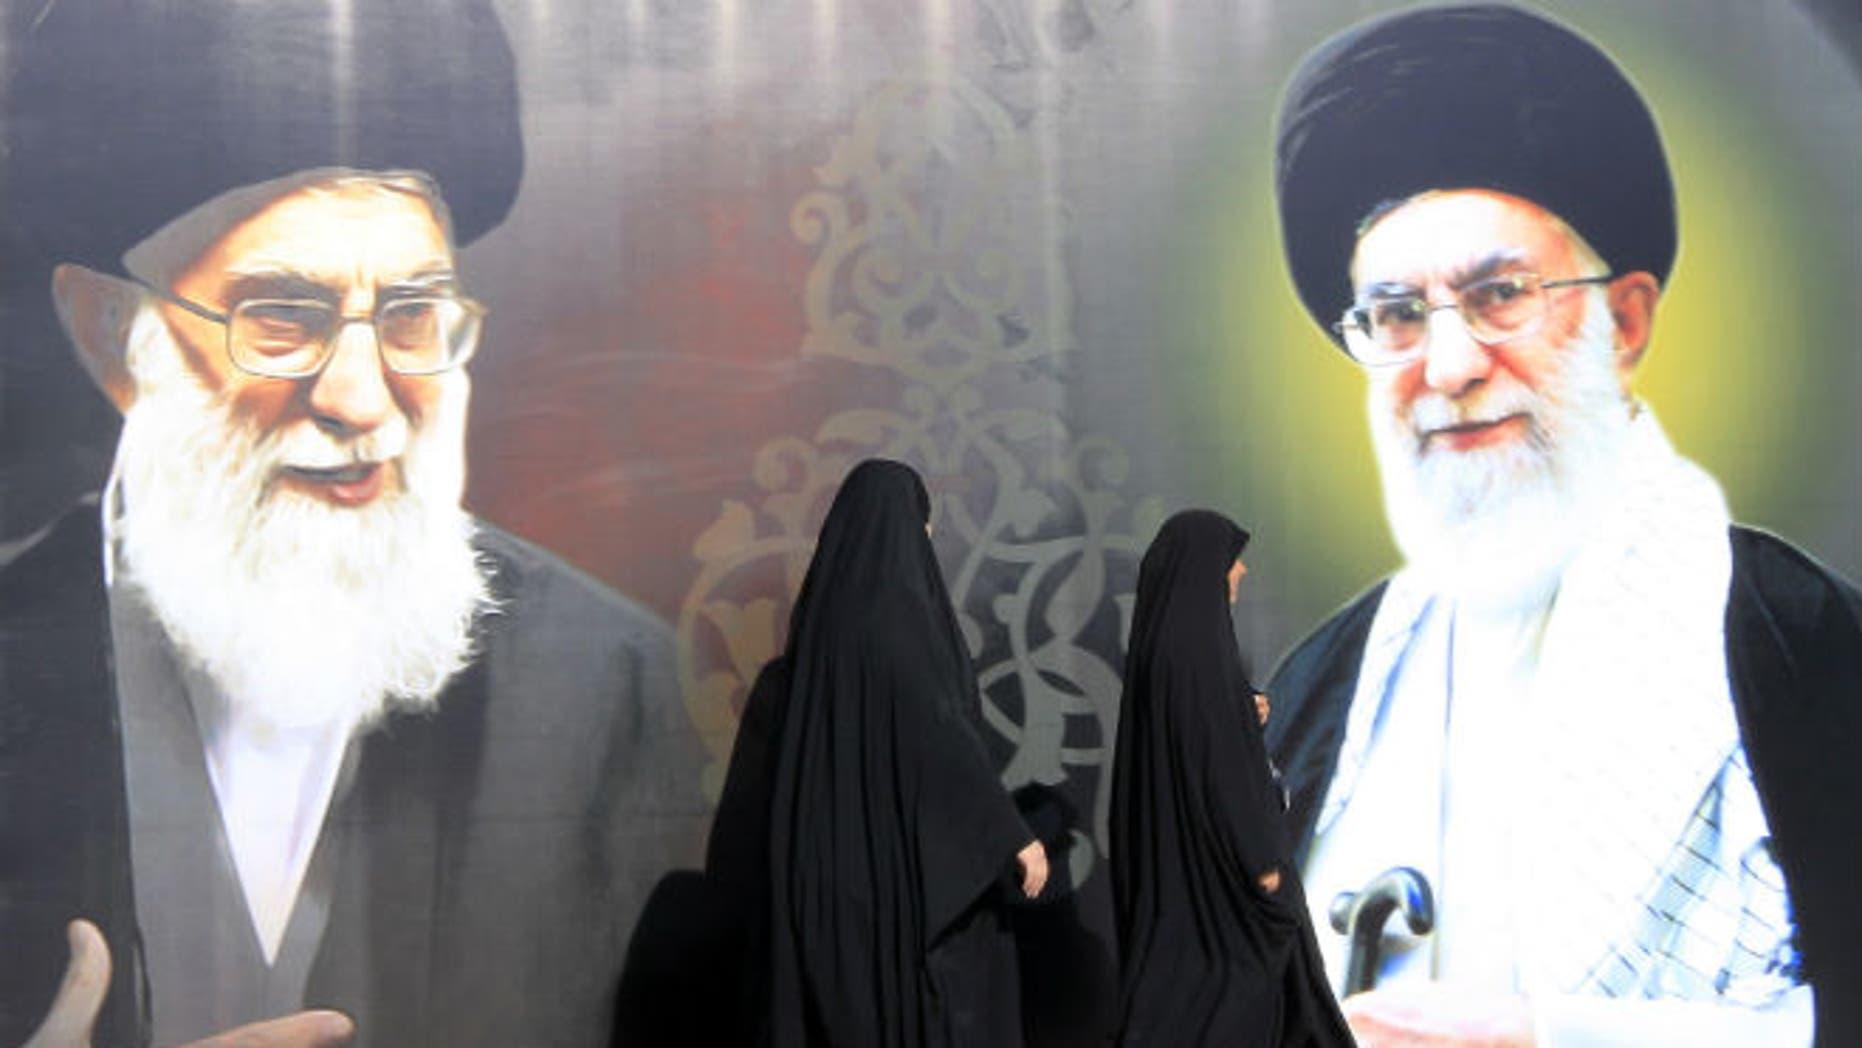 Iraqi women walk past a poster depicting images of Shi'ite Iran's Supreme Leader Ayatollah Ali Khamenei at al-Firdous Square in Baghdad February 12, 2014. (REUTERS/Ahmed Saad)